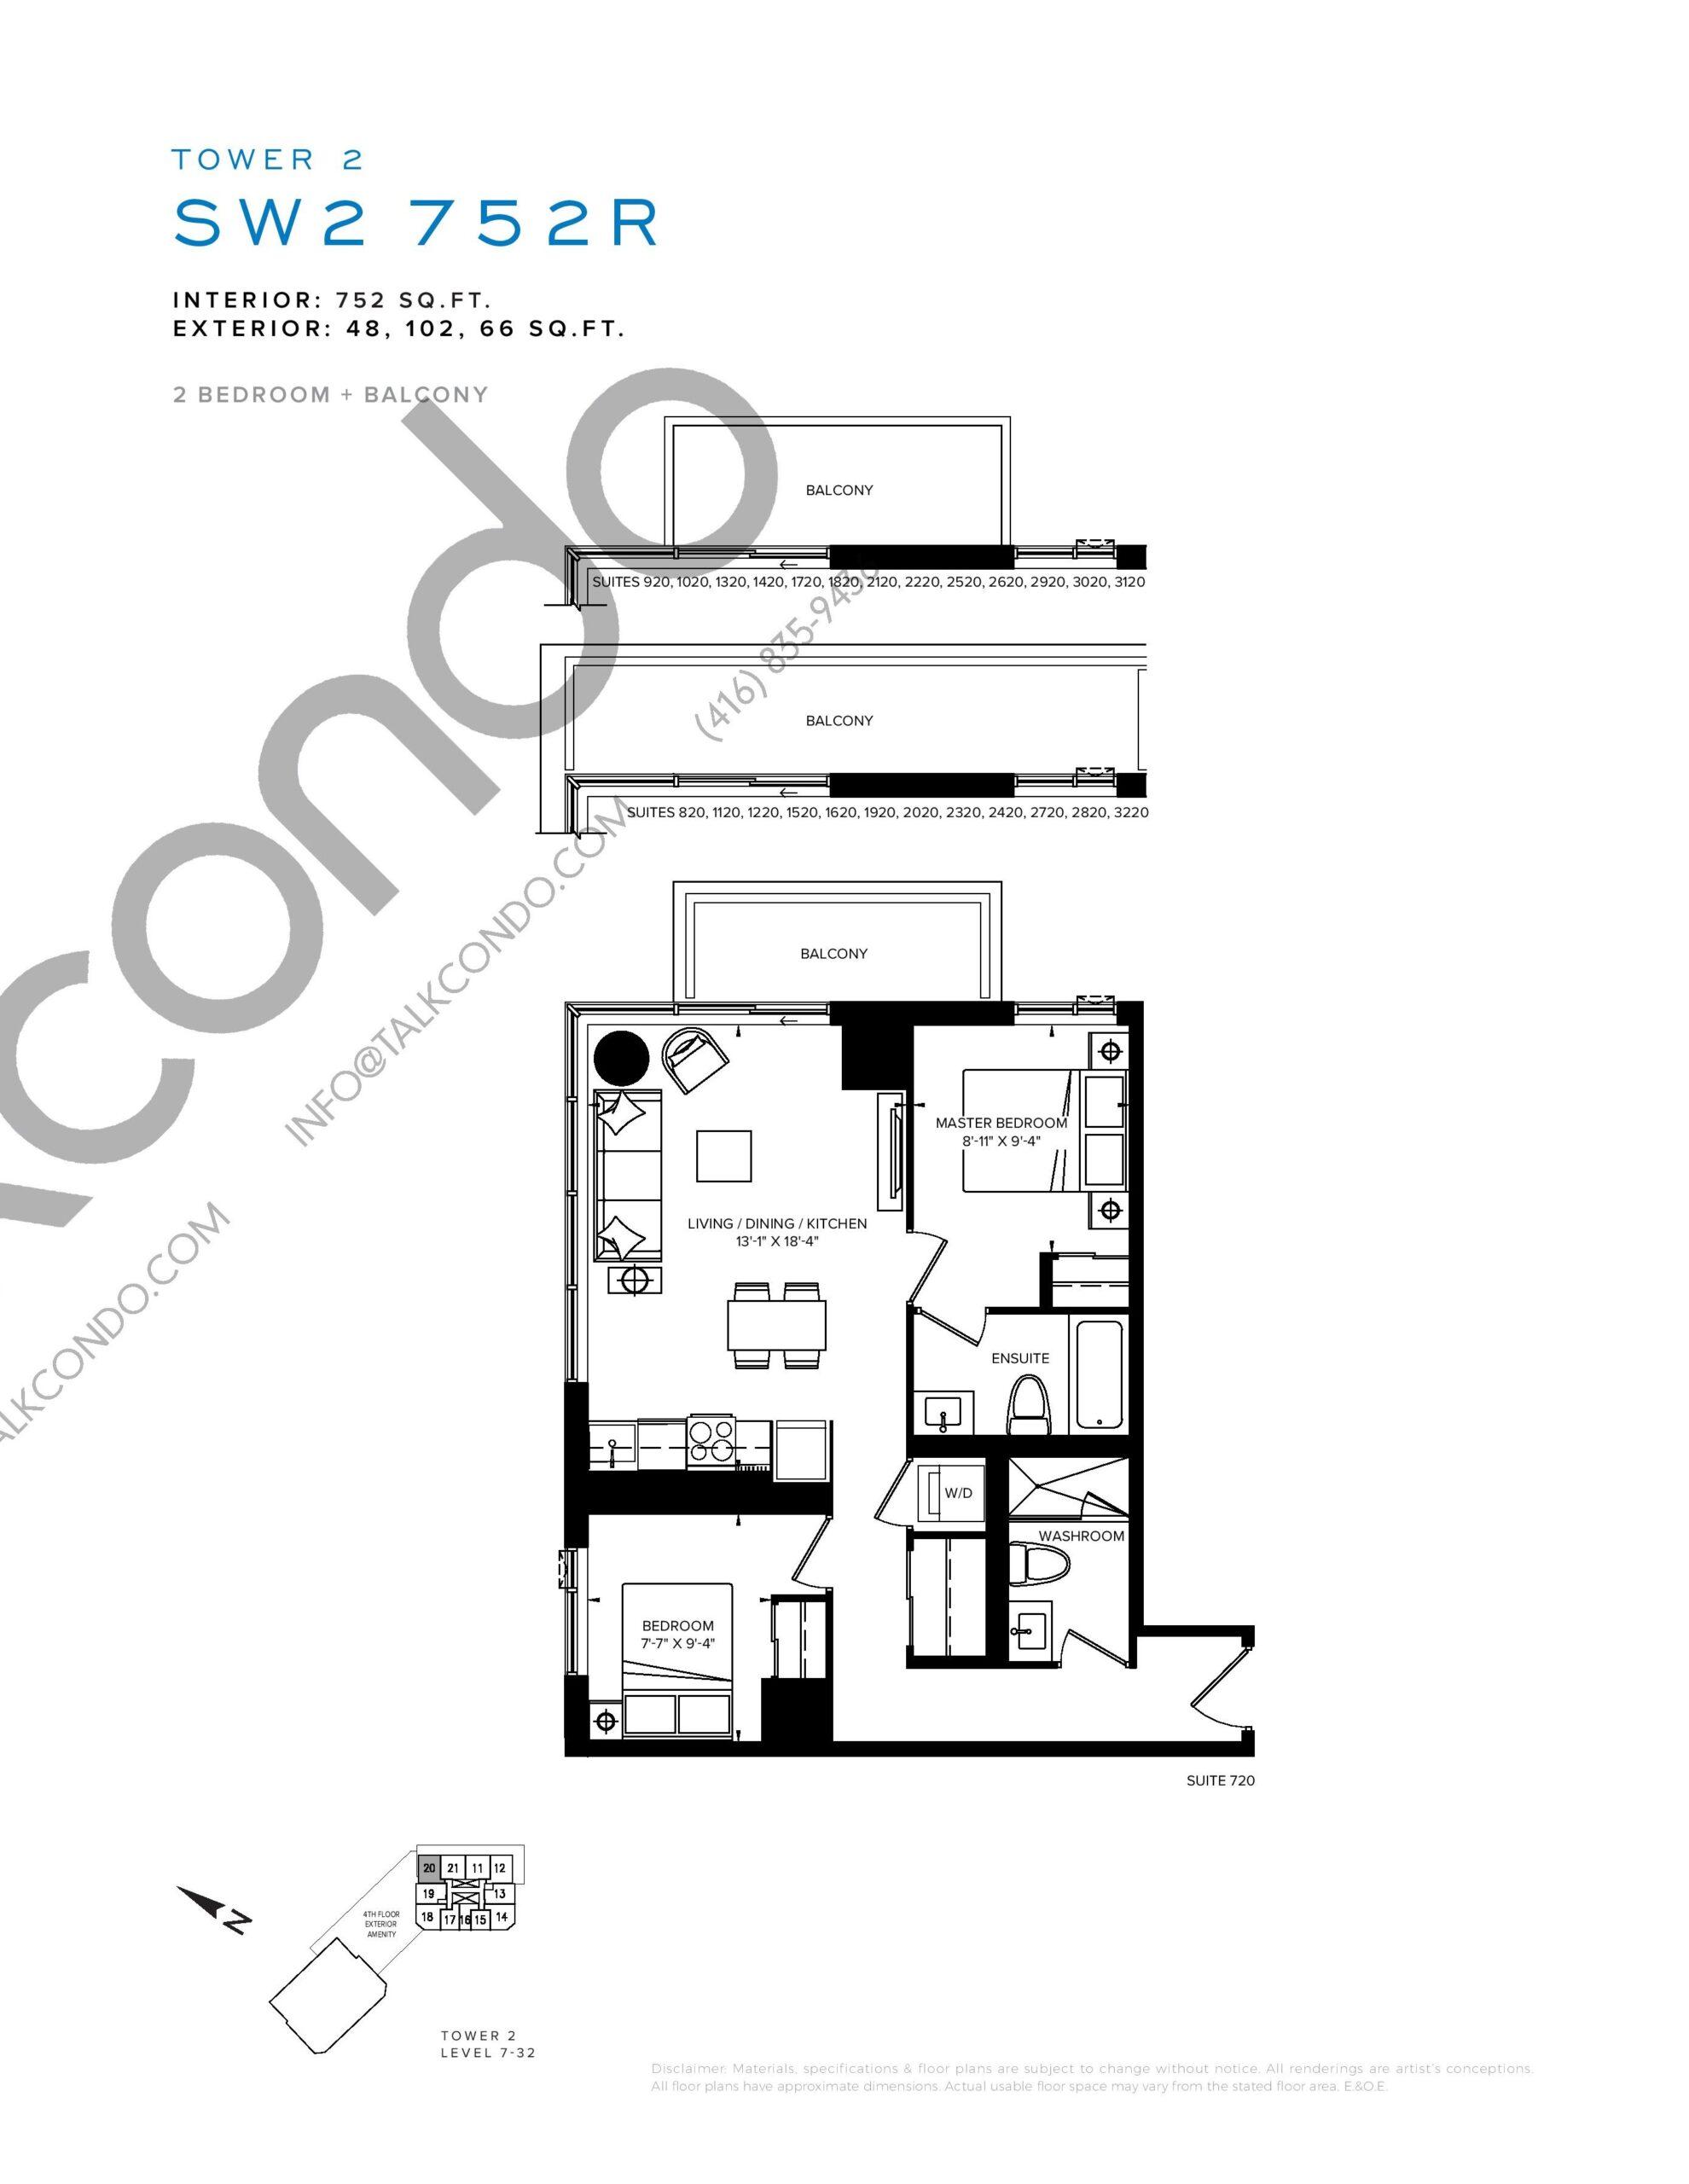 SW2 752R Floor Plan at SXSW Tower 2 Condos (SXSW2) - 752 sq.ft